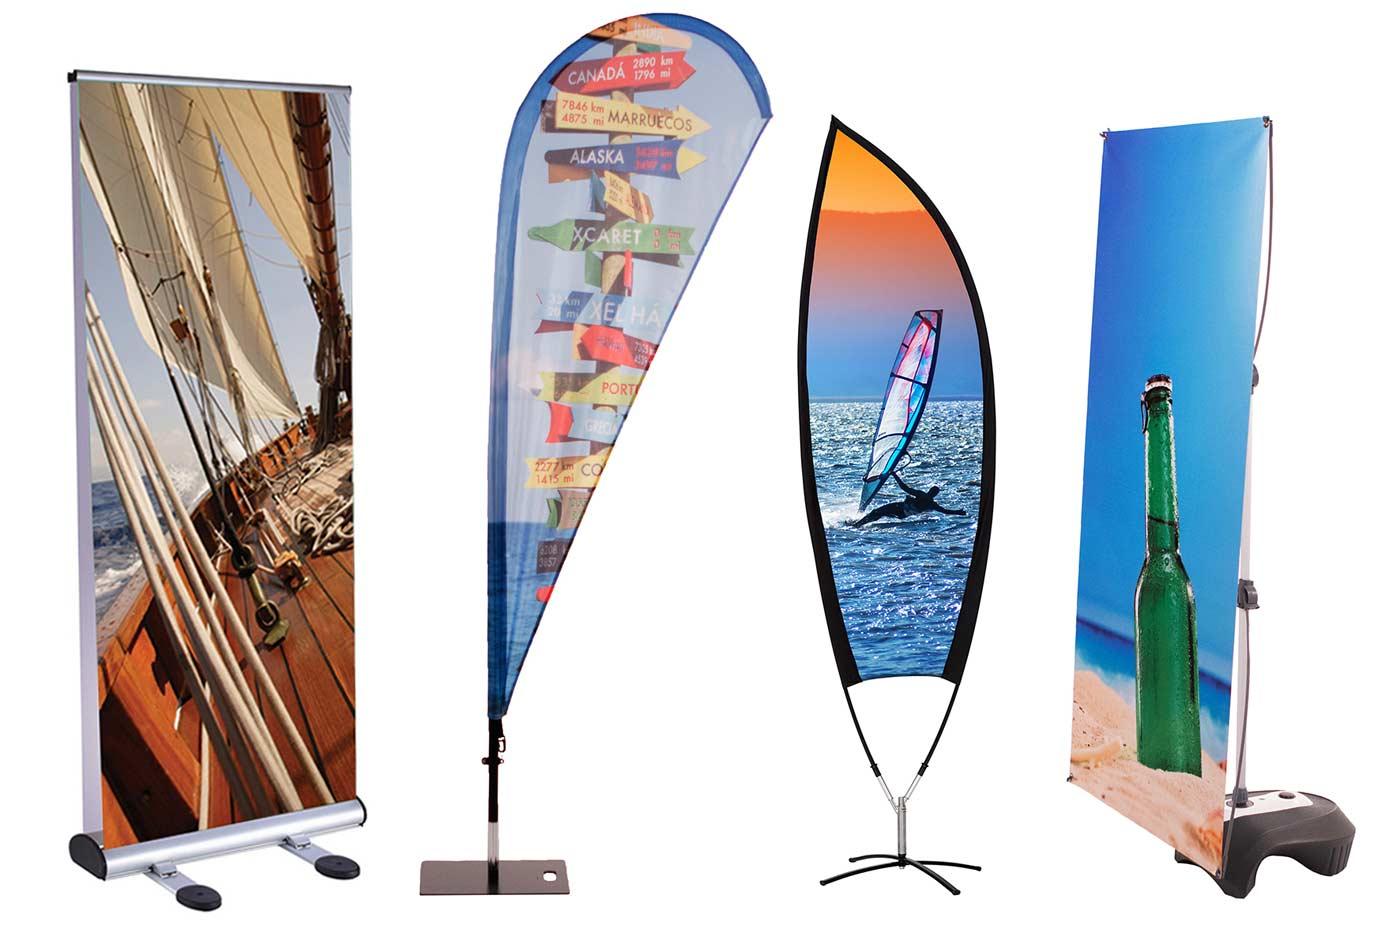 messeequipment-mobile-messewaende-Outdoor-Collage-eventpoint